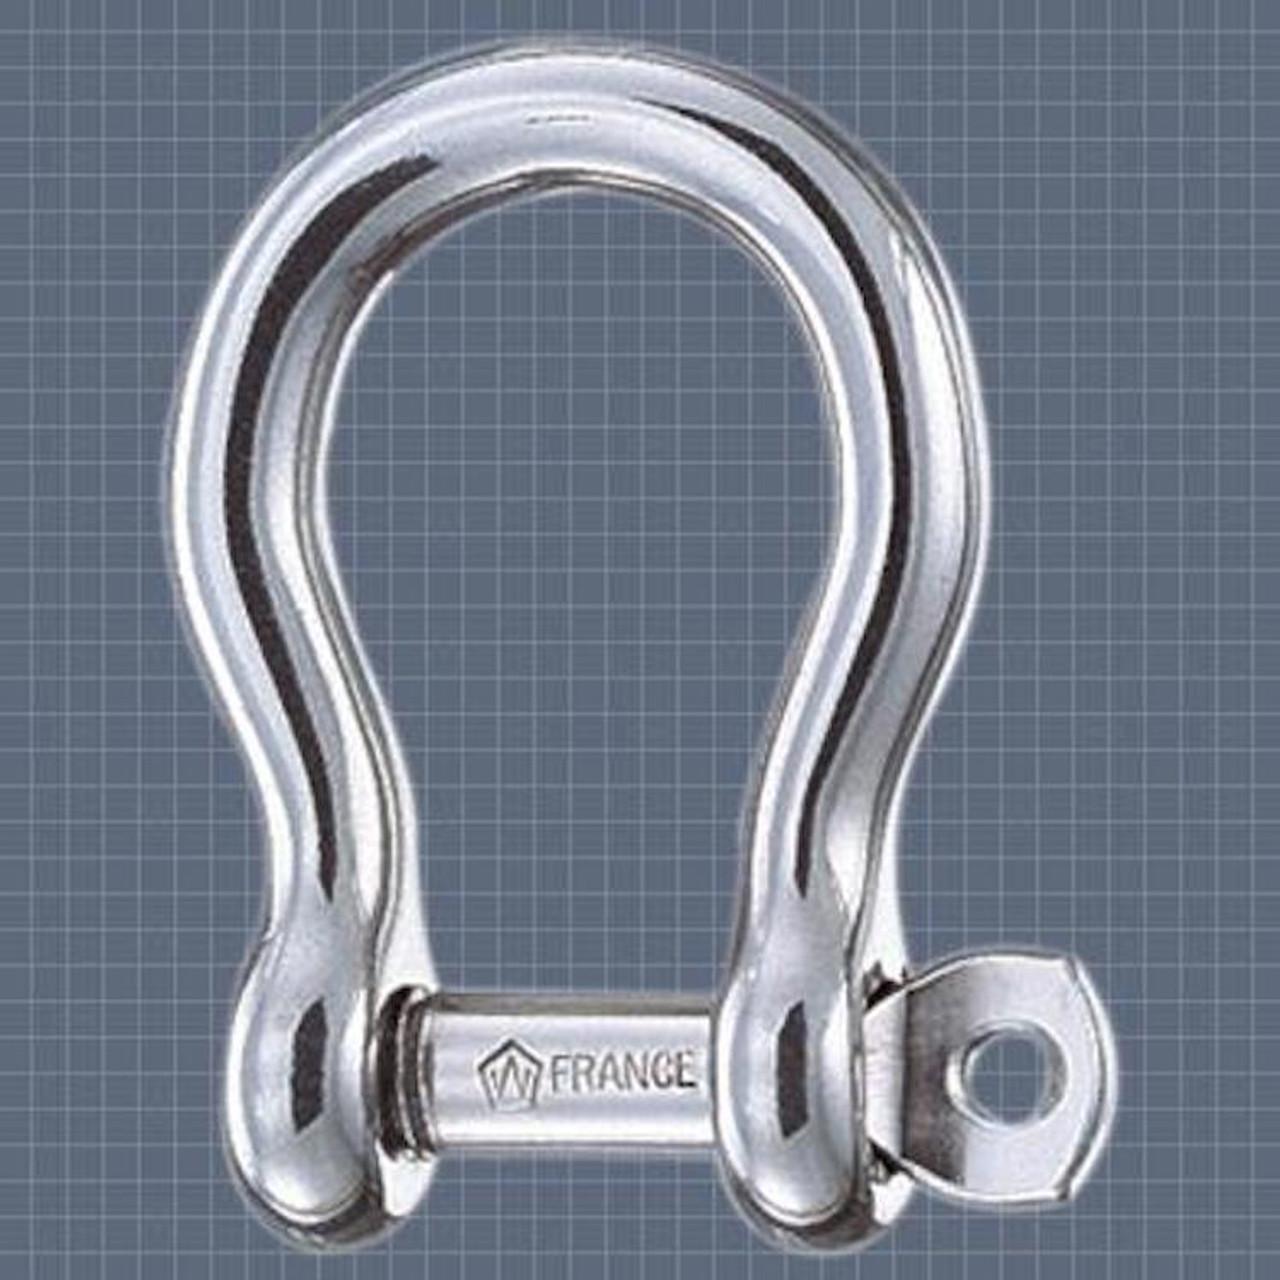 Wichard 5 mm Self Locking Bow Shackle